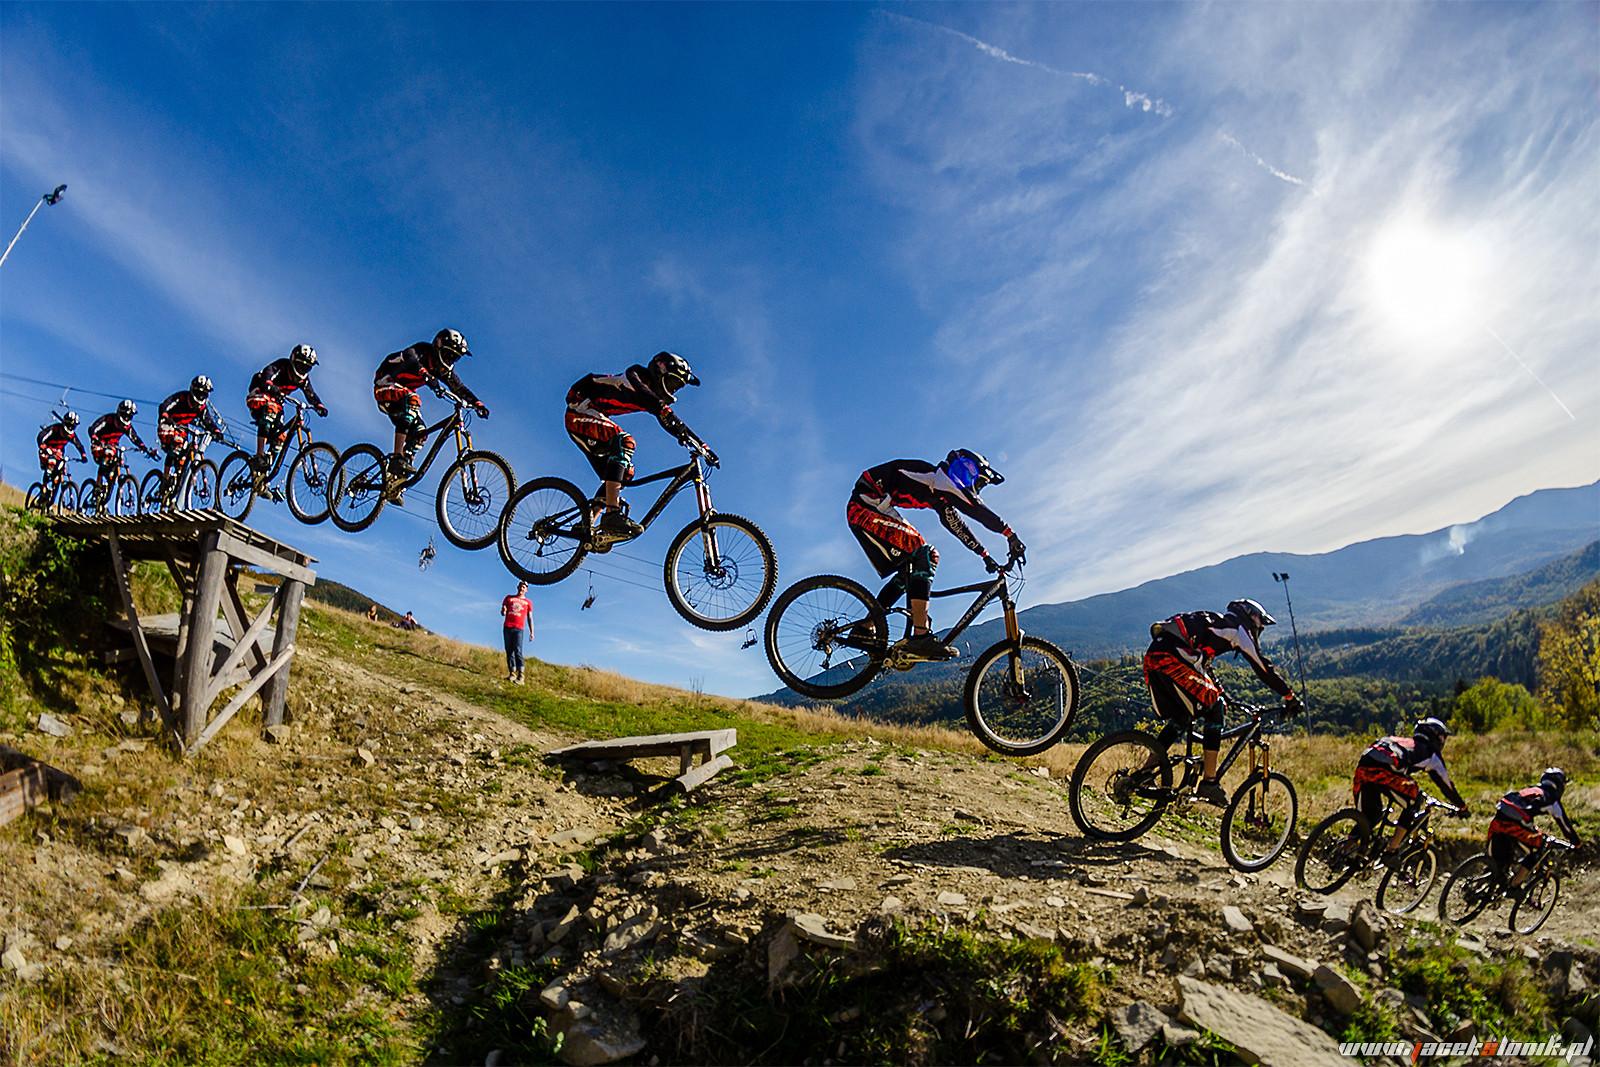 Kuba Koniuszewski - JacekSlonik - Mountain Biking Pictures - Vital MTB